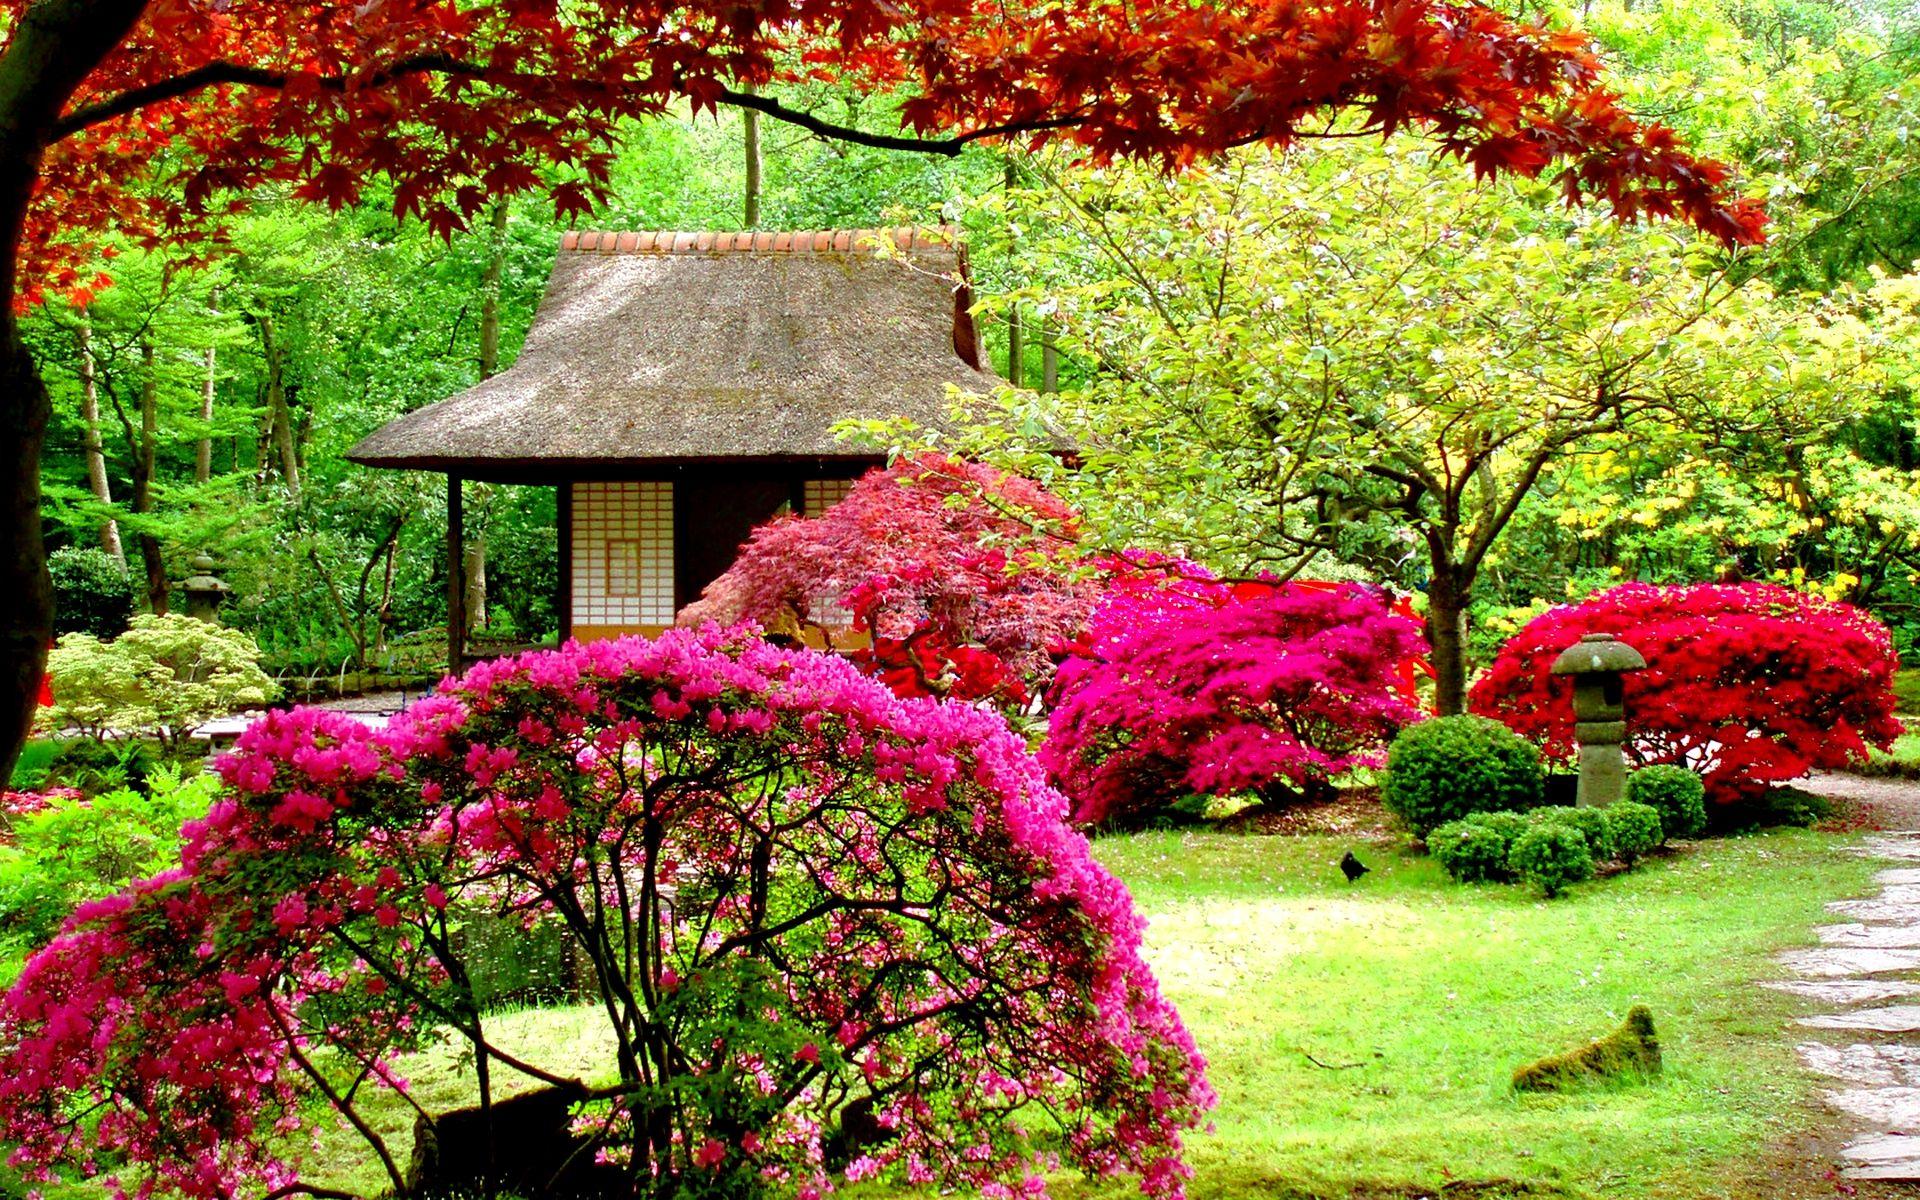 Lush Greenery Pictures Beautiful Gardens Japanese Garden Design Beautiful Flowers Garden Japanese Garden